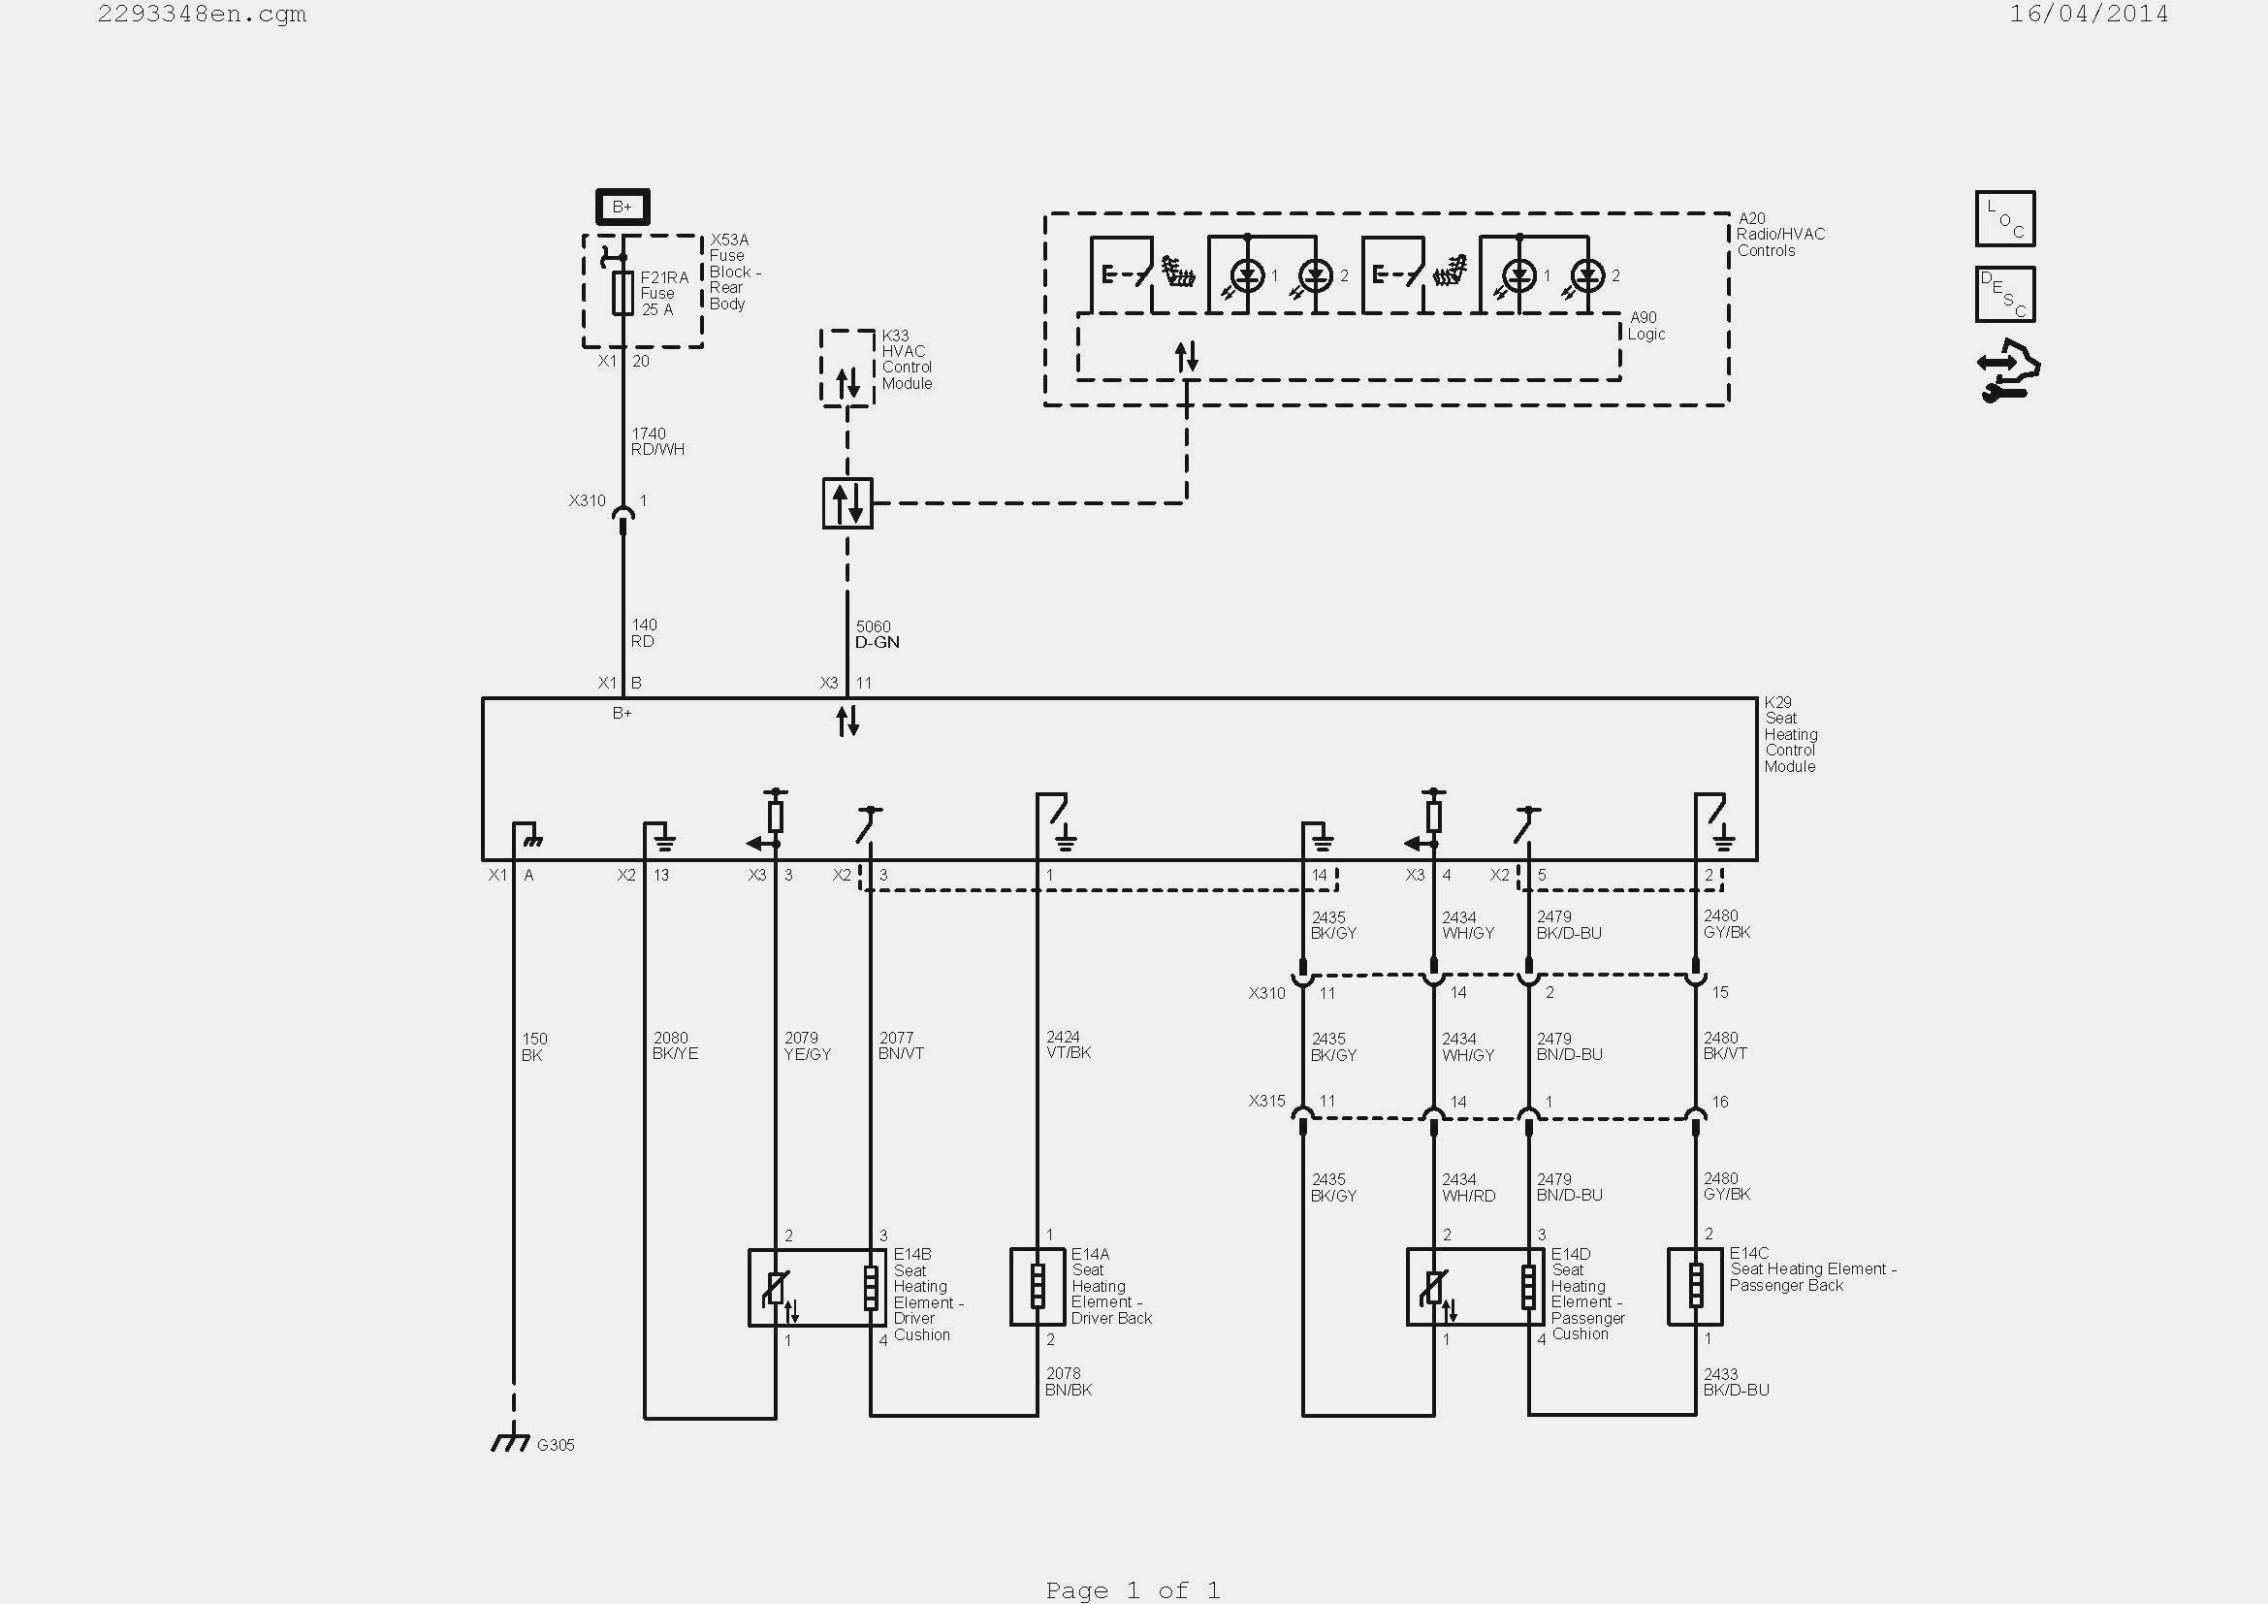 cm b wiring diagram wiring diagrams valuecm b wiring diagram schematic diagram database cm b wiring